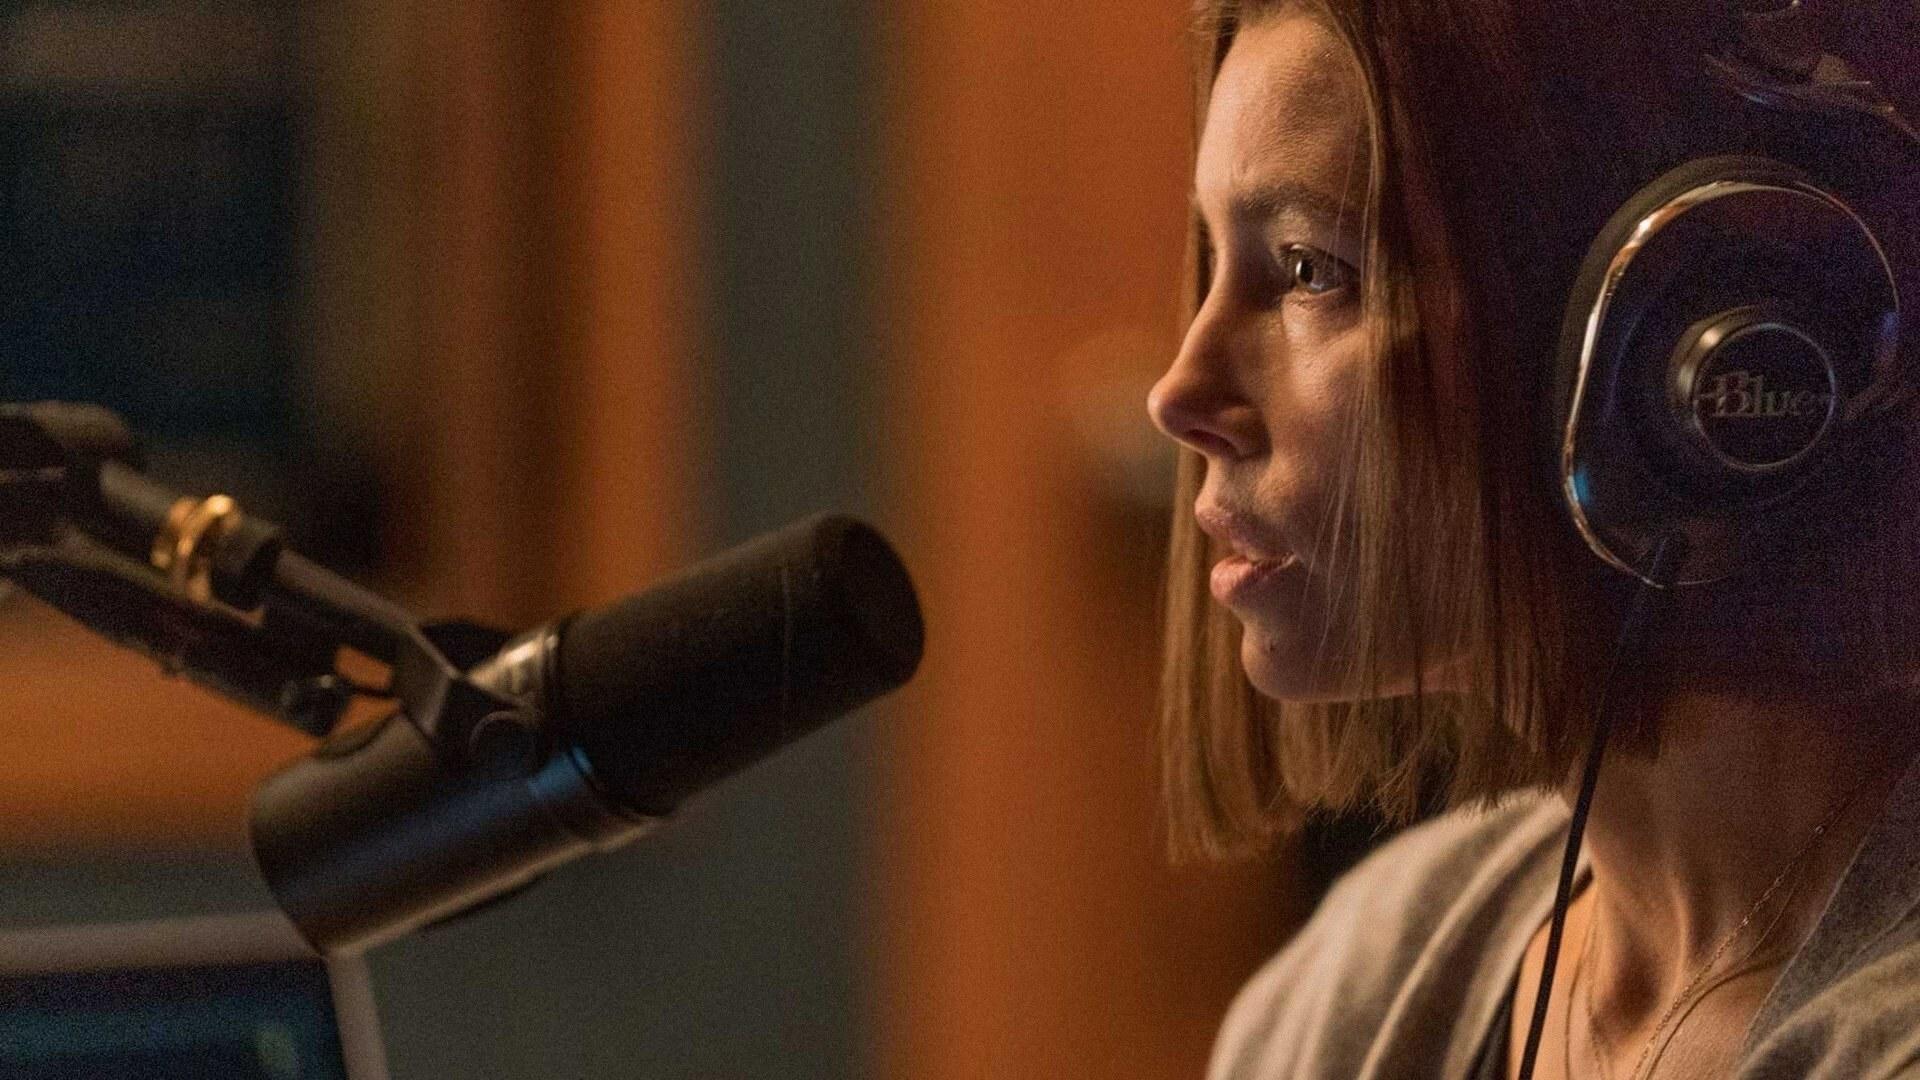 Jessica Biel talking into a microphone